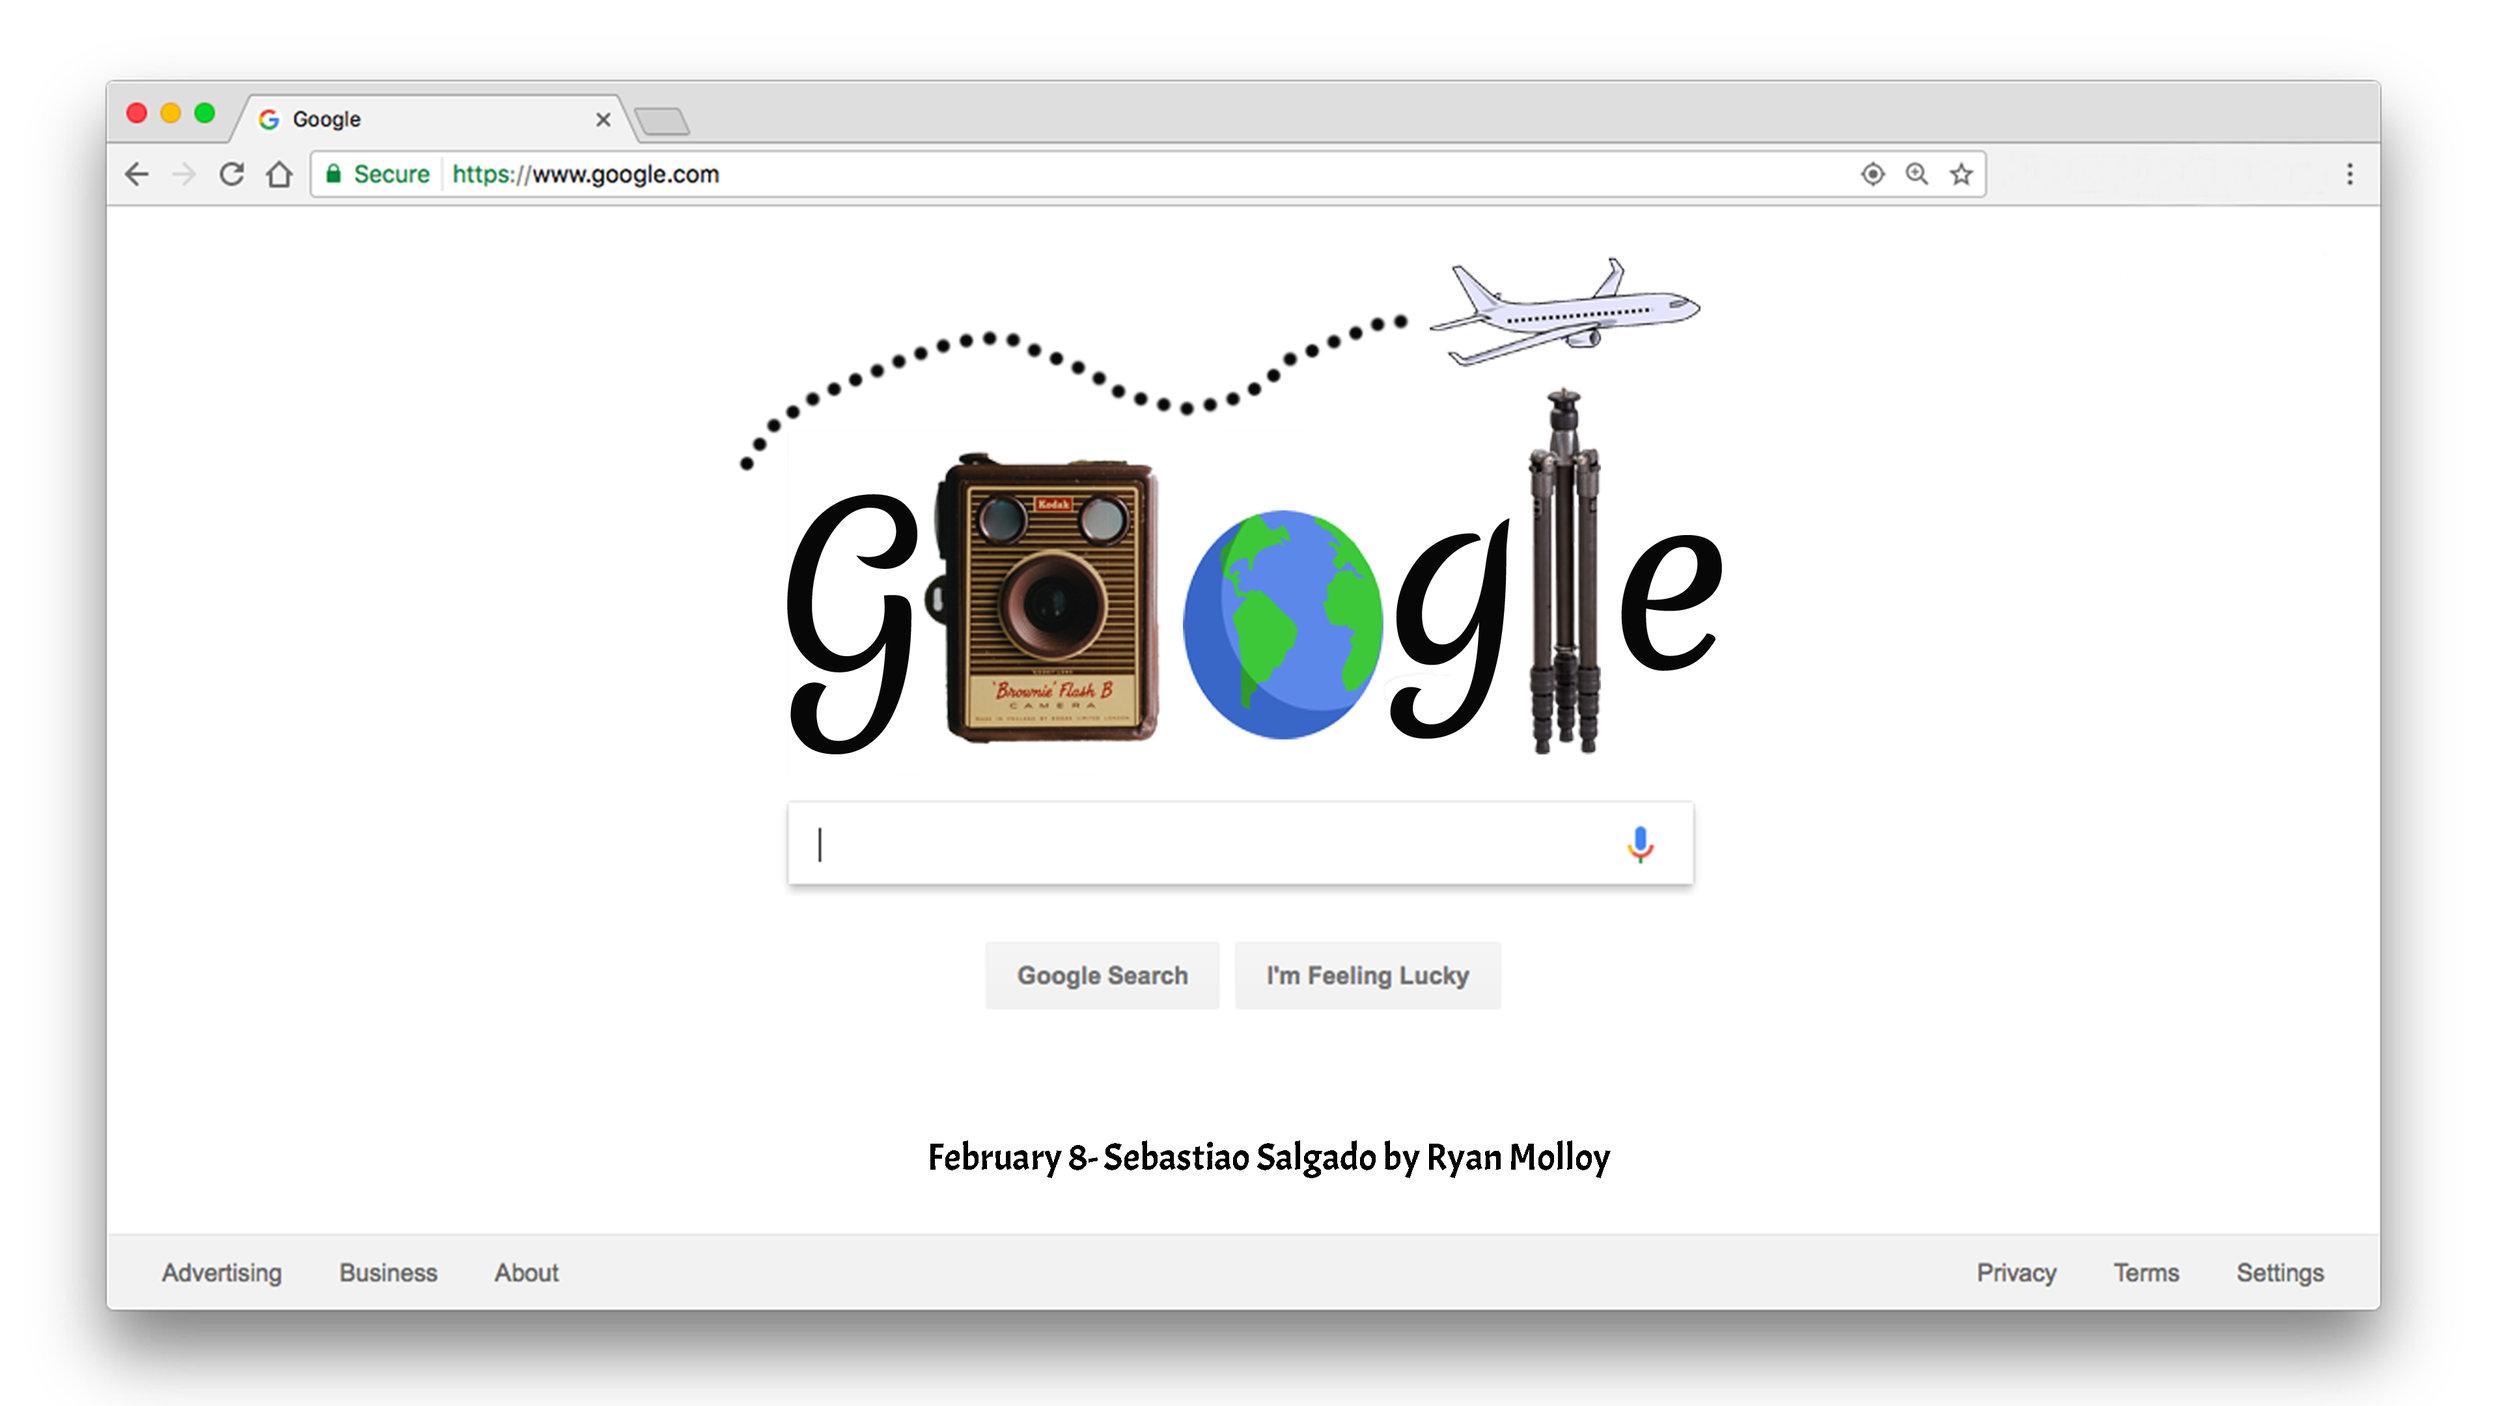 Molloy_GoogleDoodle_v3.jpg